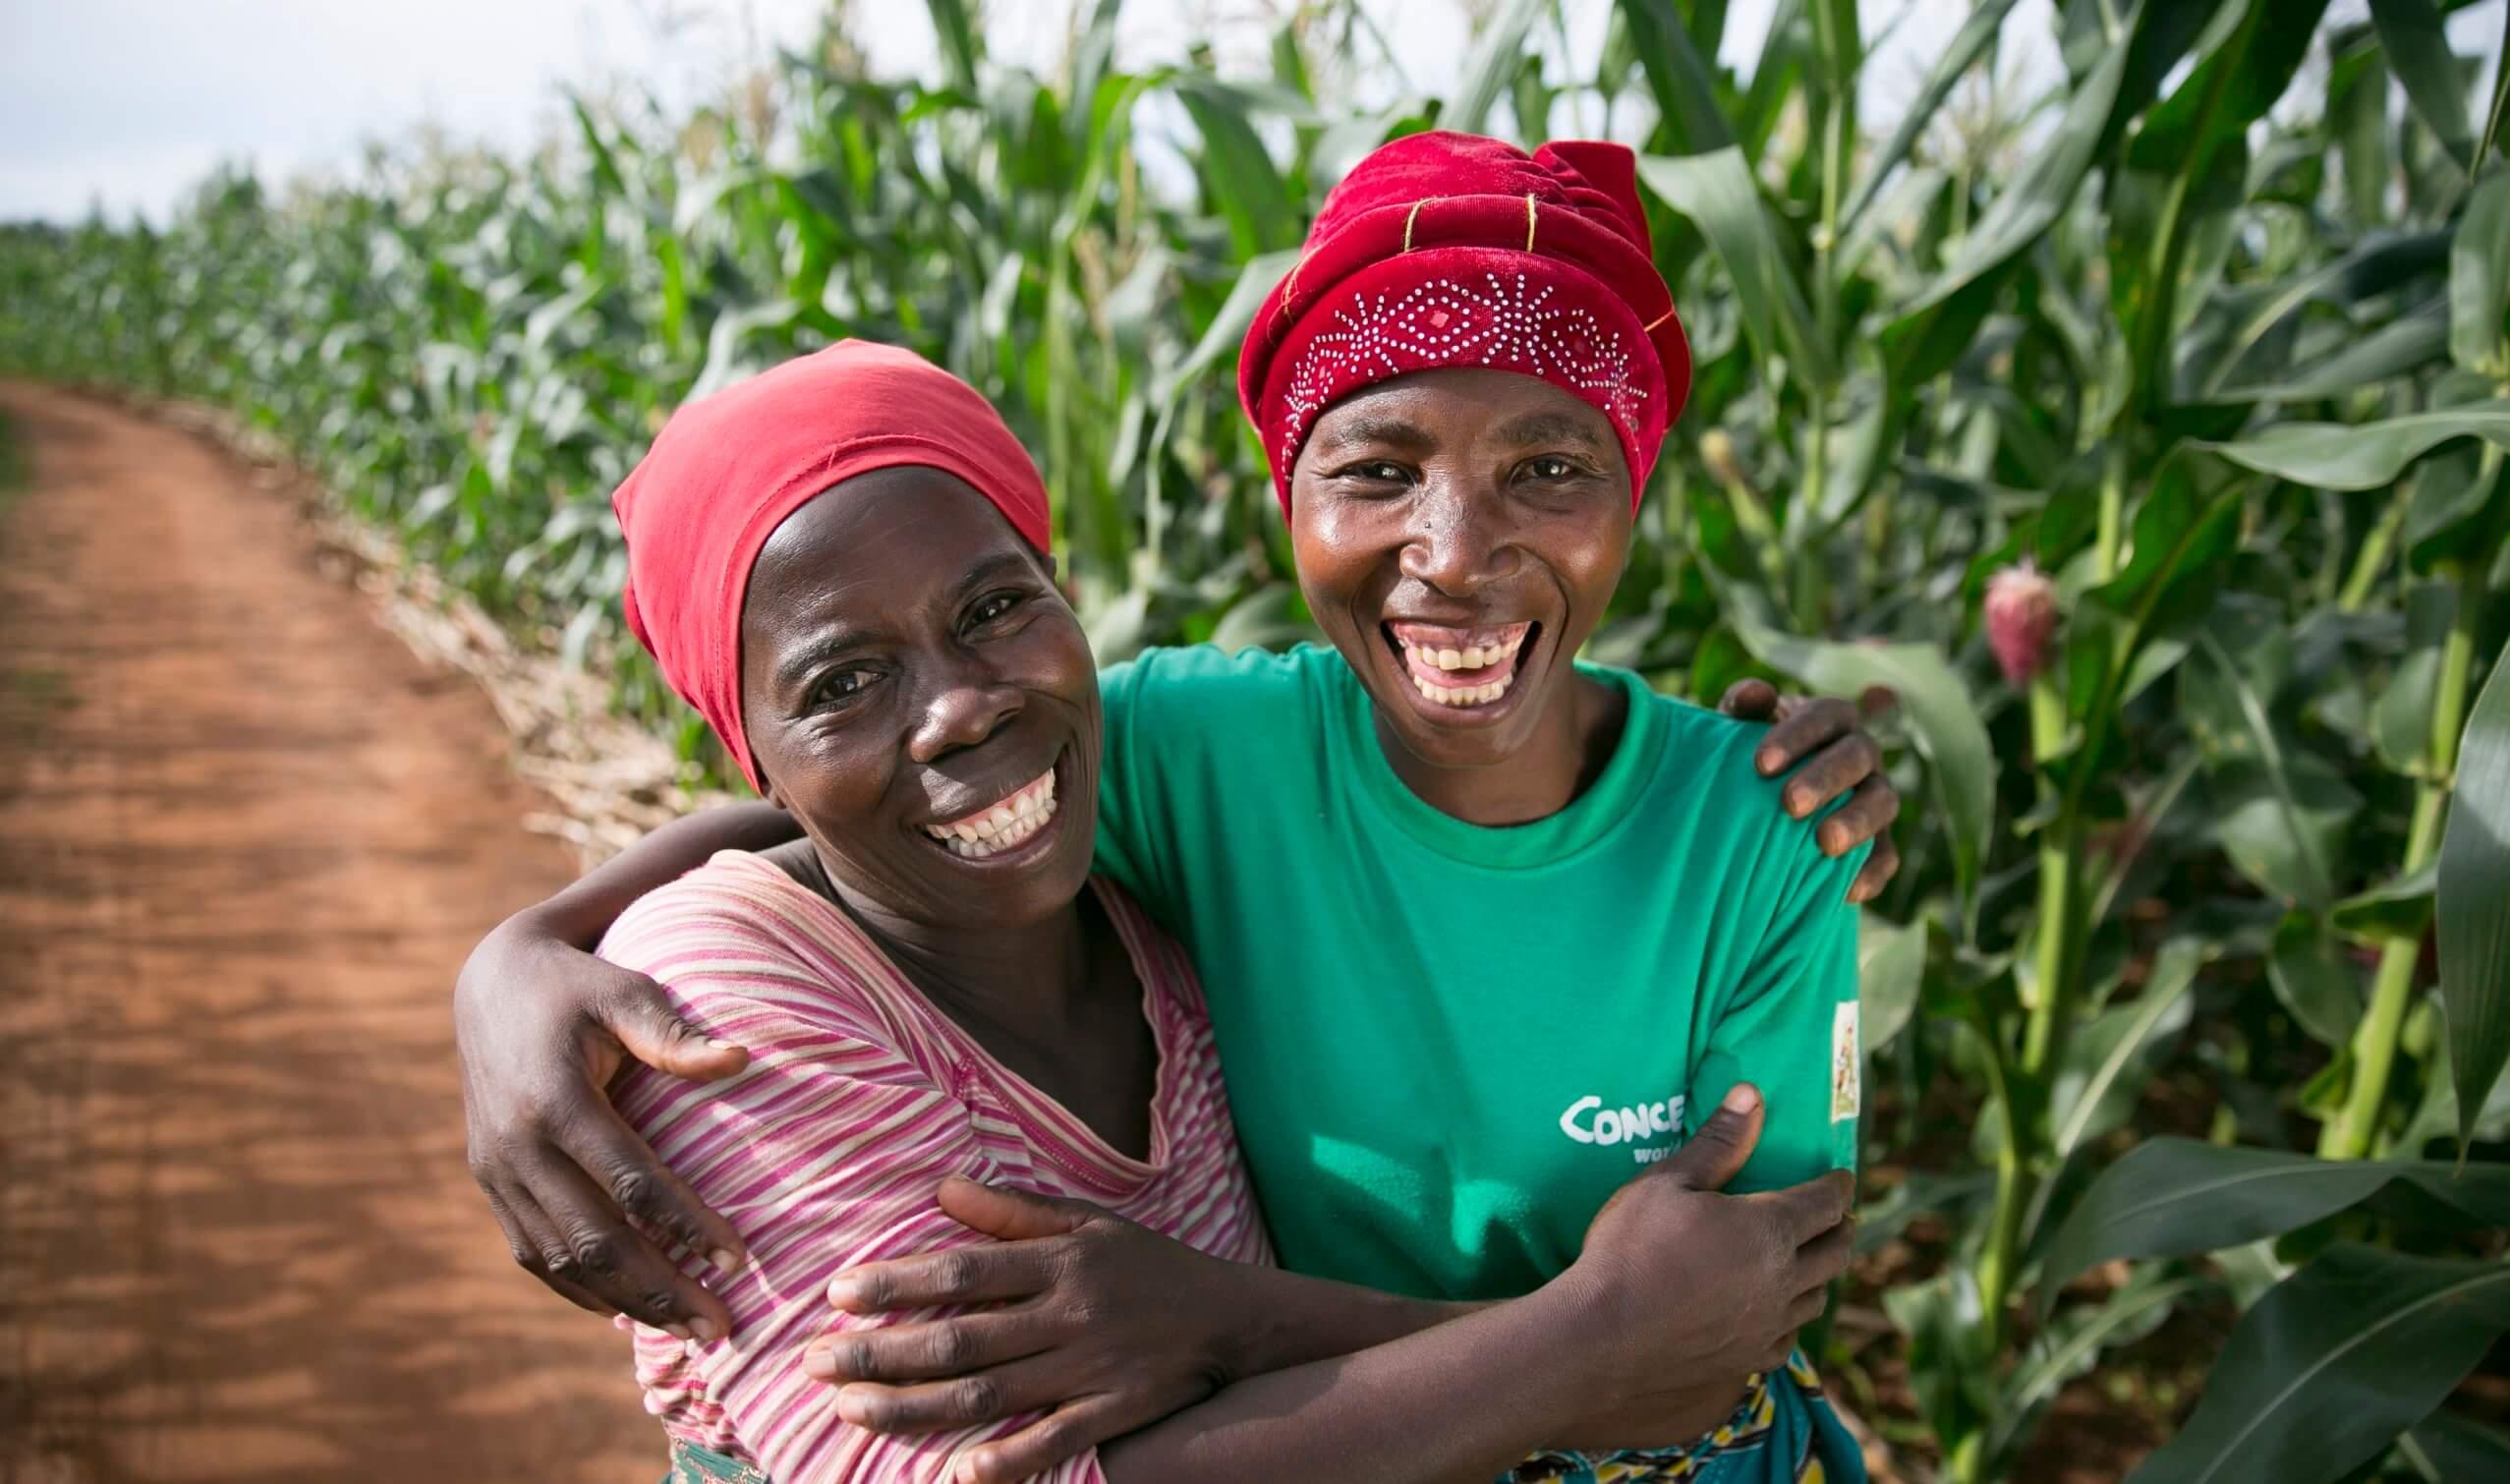 Concern Worldwide update us on their progress since receiving their Scott Bader Commonwealth grant